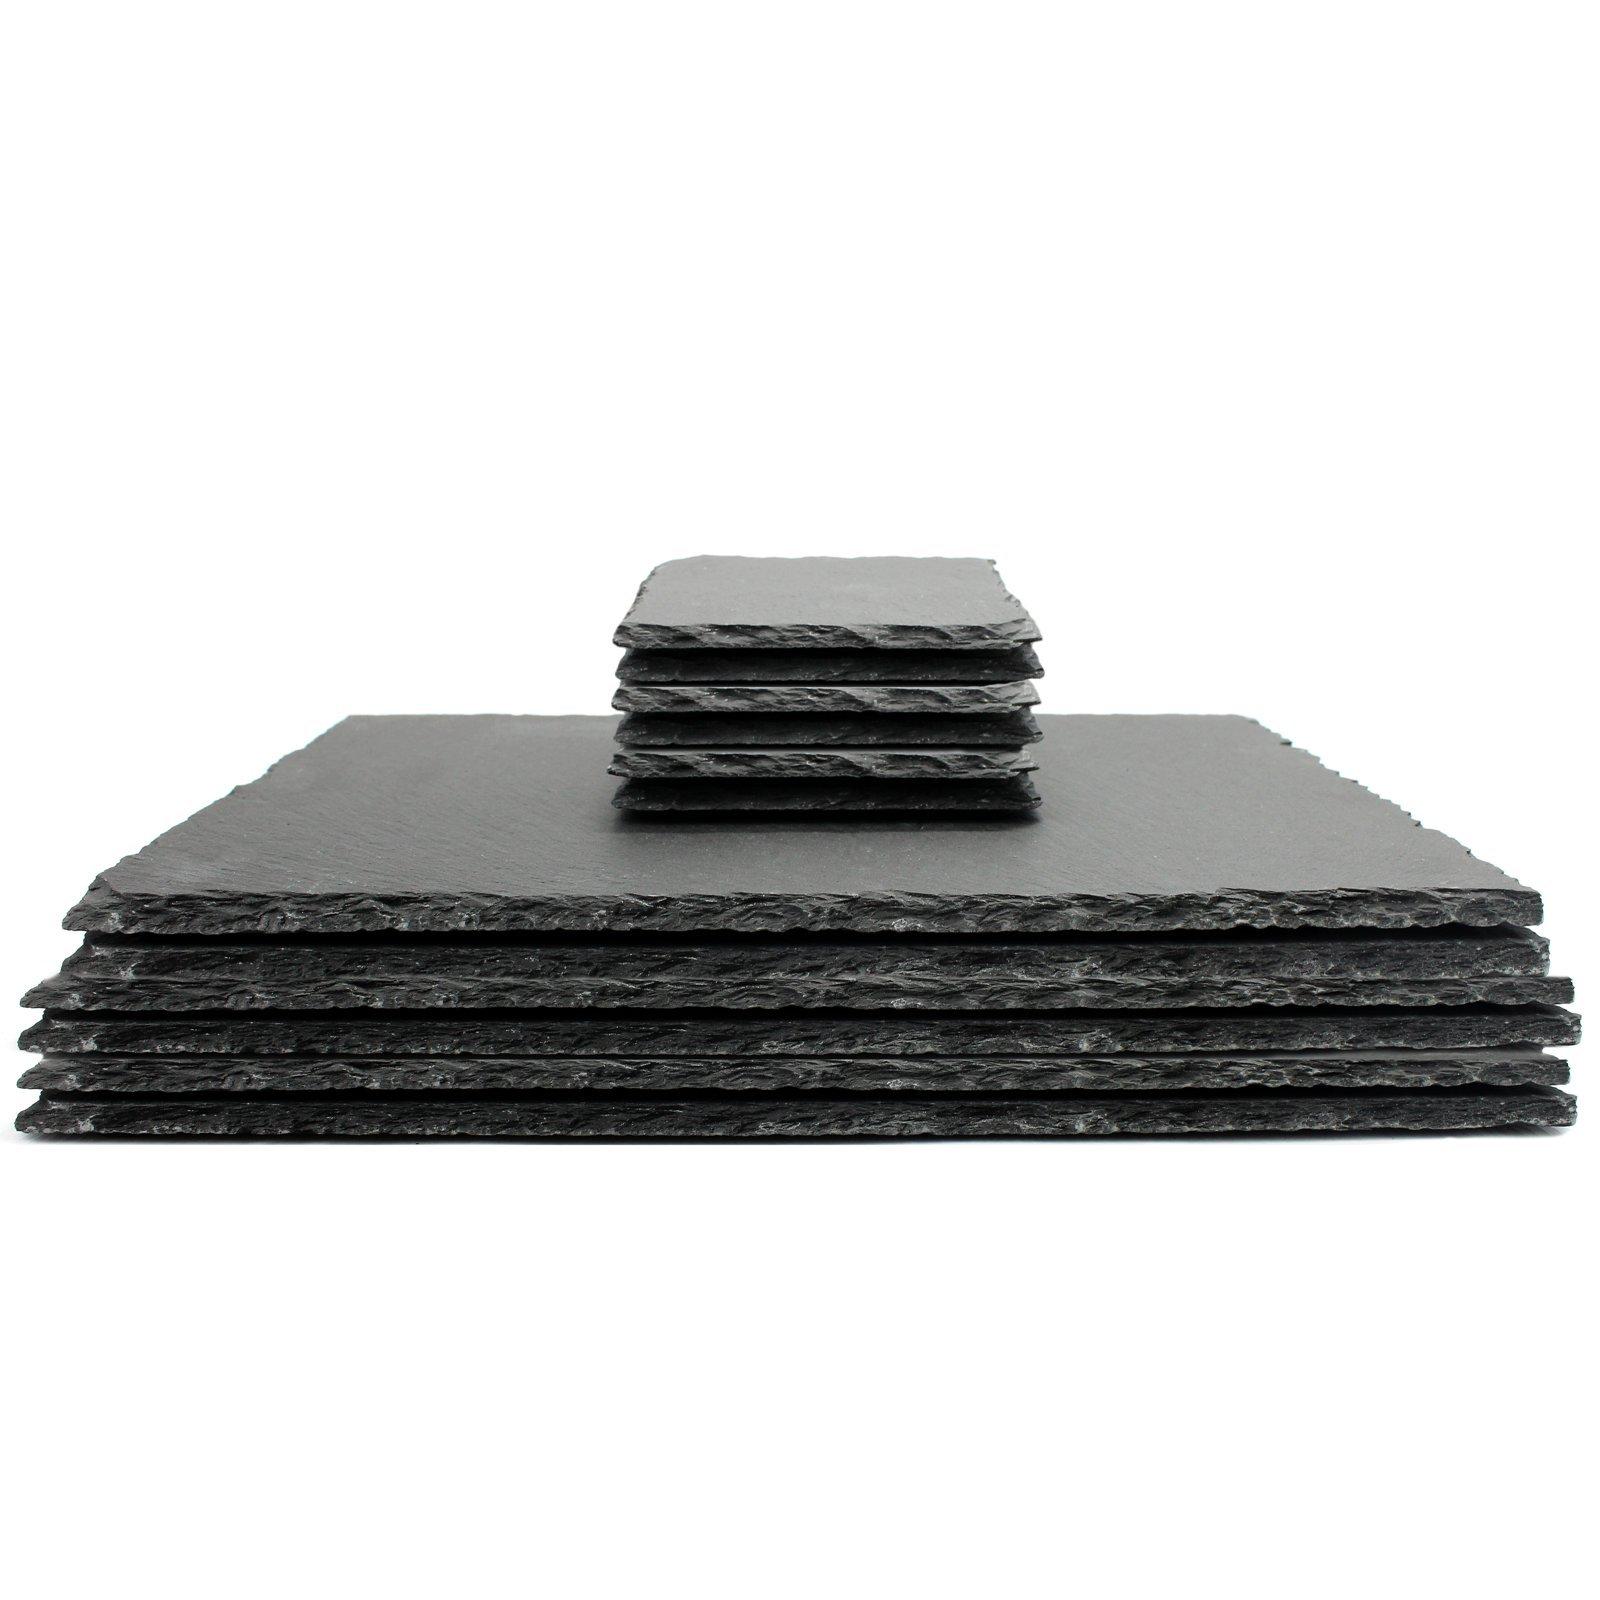 Pack of Slate Coasters Non-Slip /& Heat Resistant Fine Cut Square M/&W